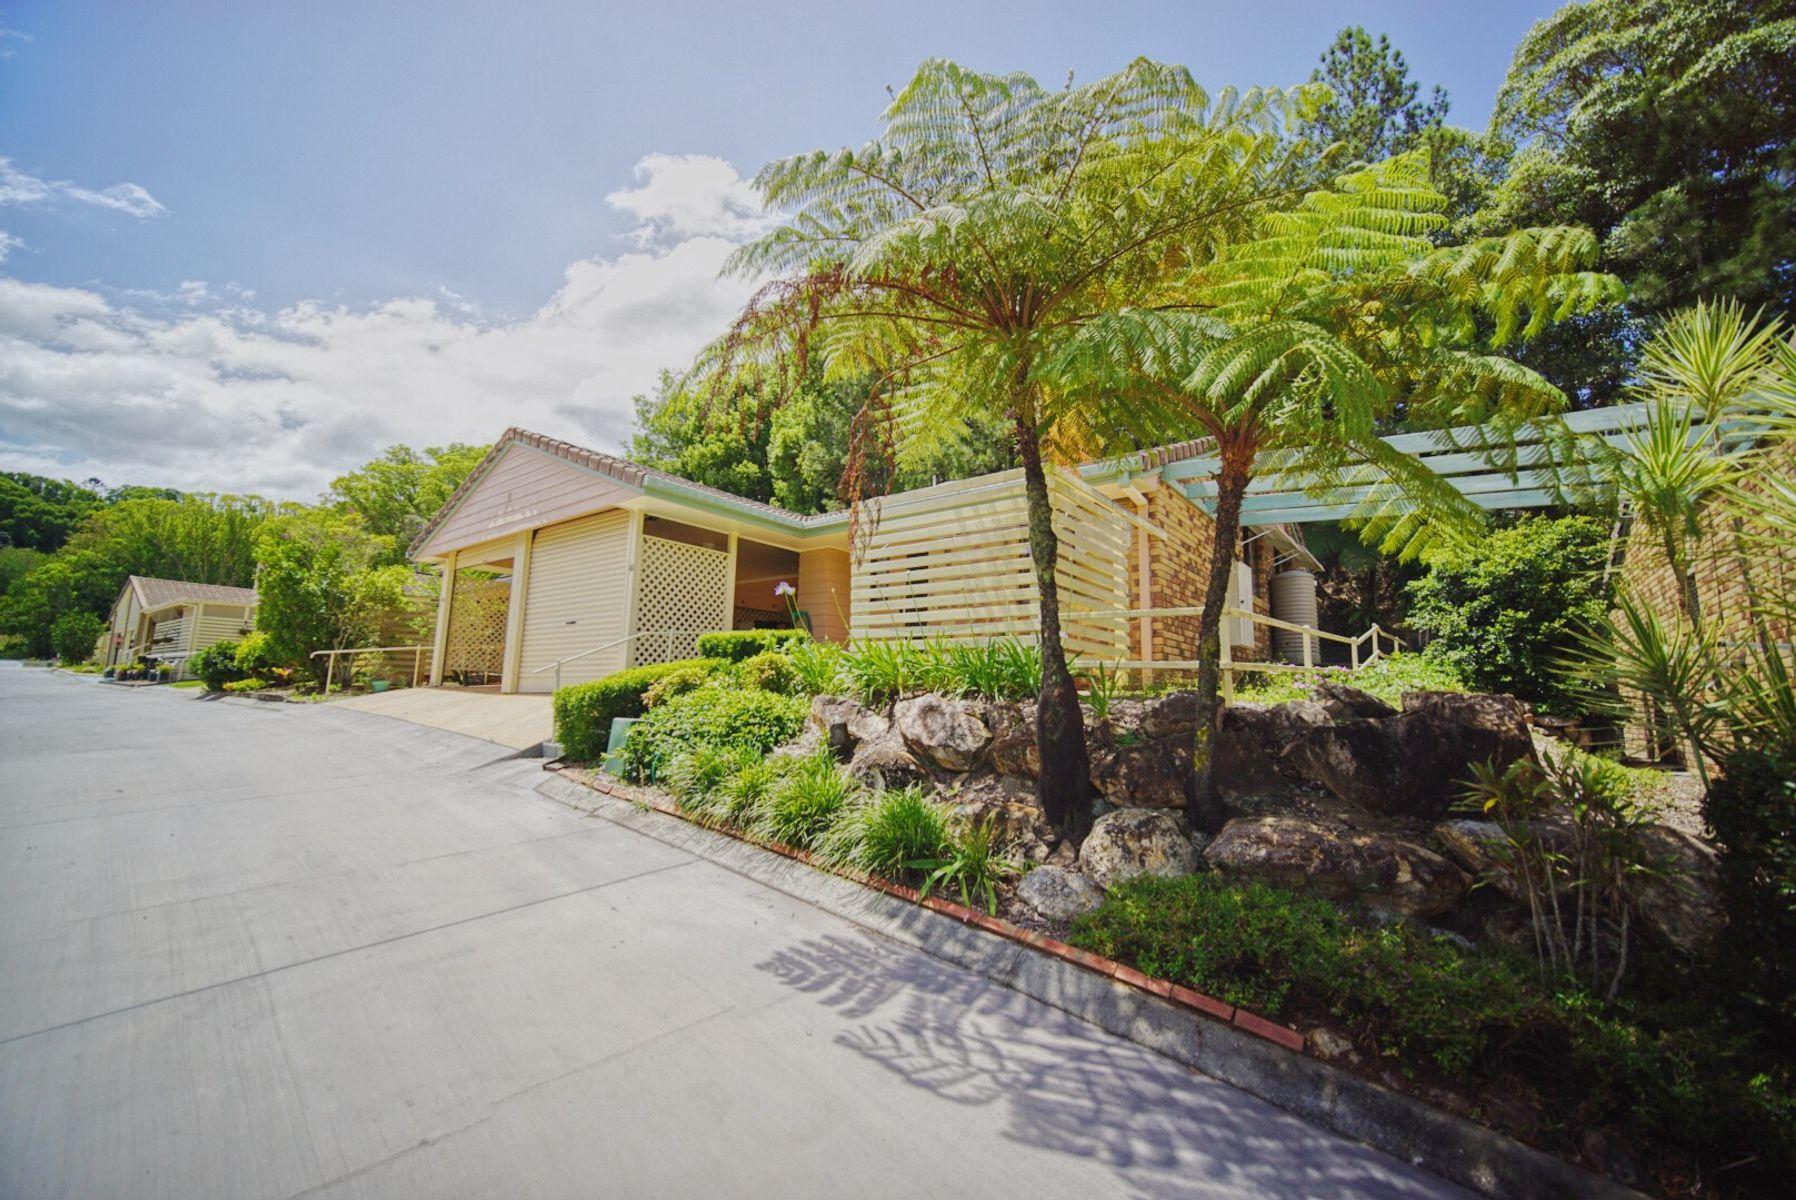 55/18 Doolan Street, Nambour, QLD 4560